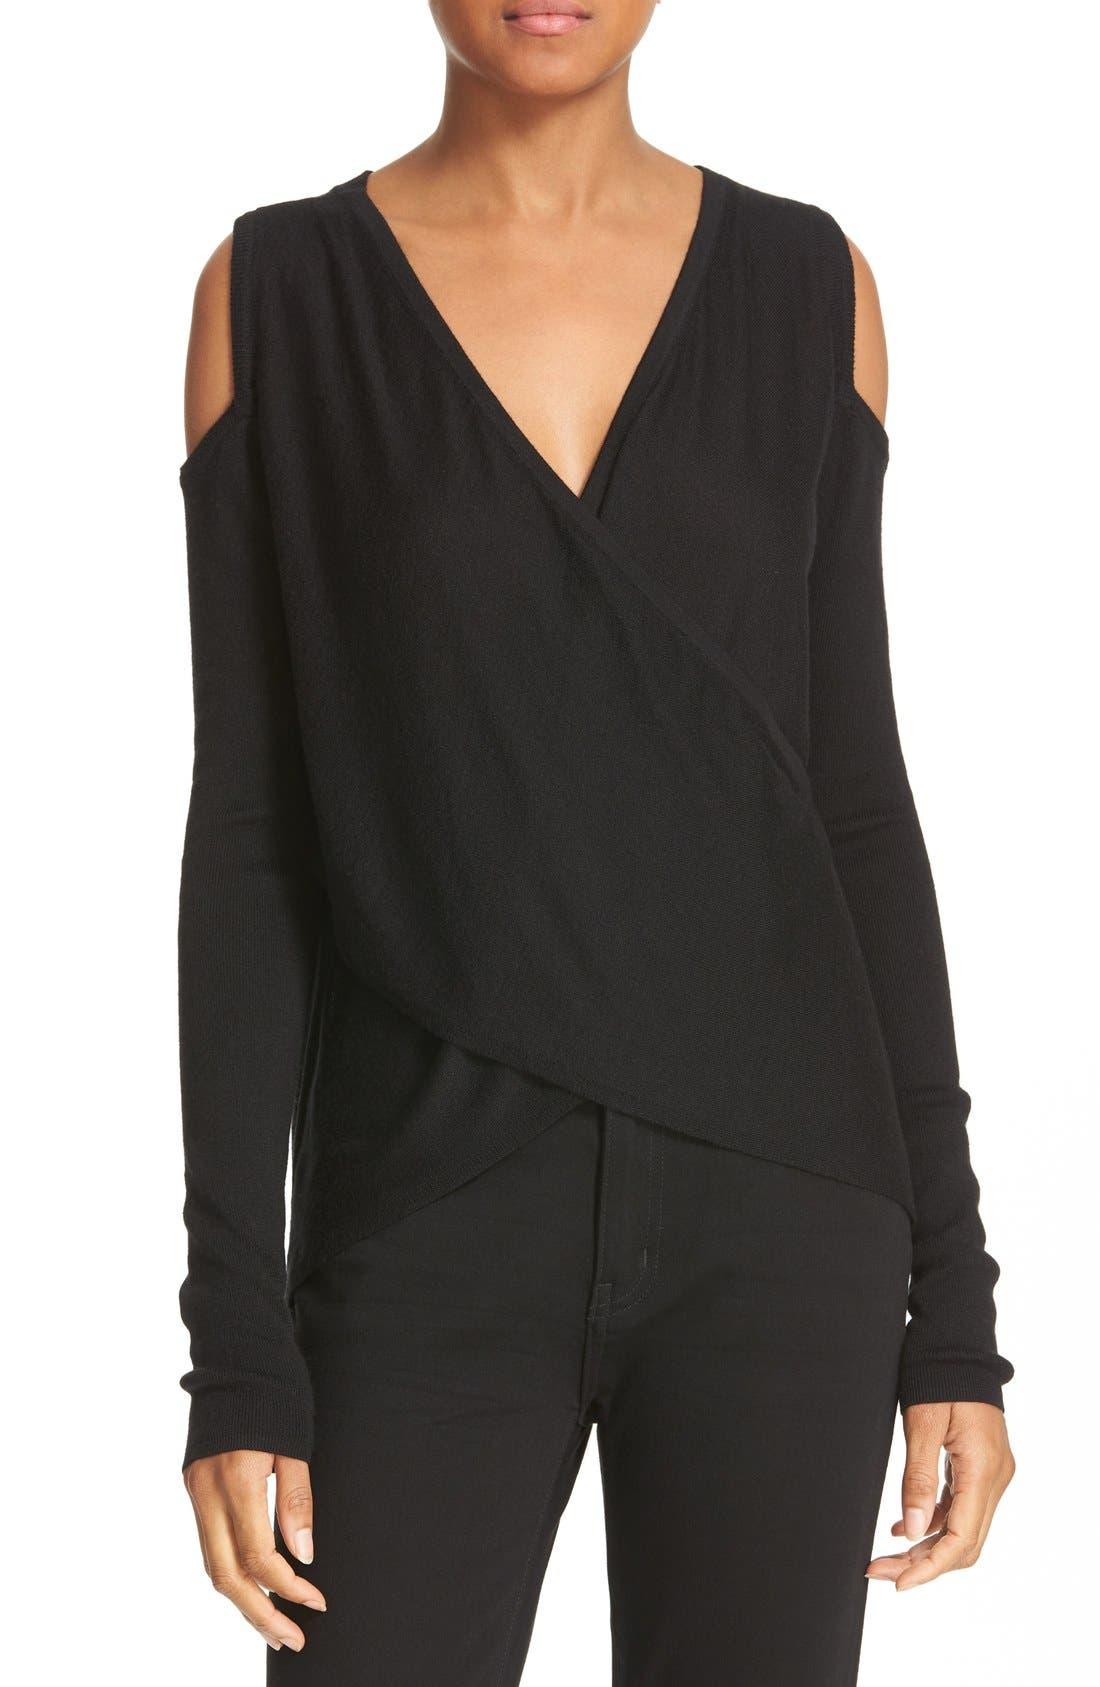 Alternate Image 1 Selected - 10 Crosby Derek Lam Knit Silk & Cashmere Cold Shoulder Sweater